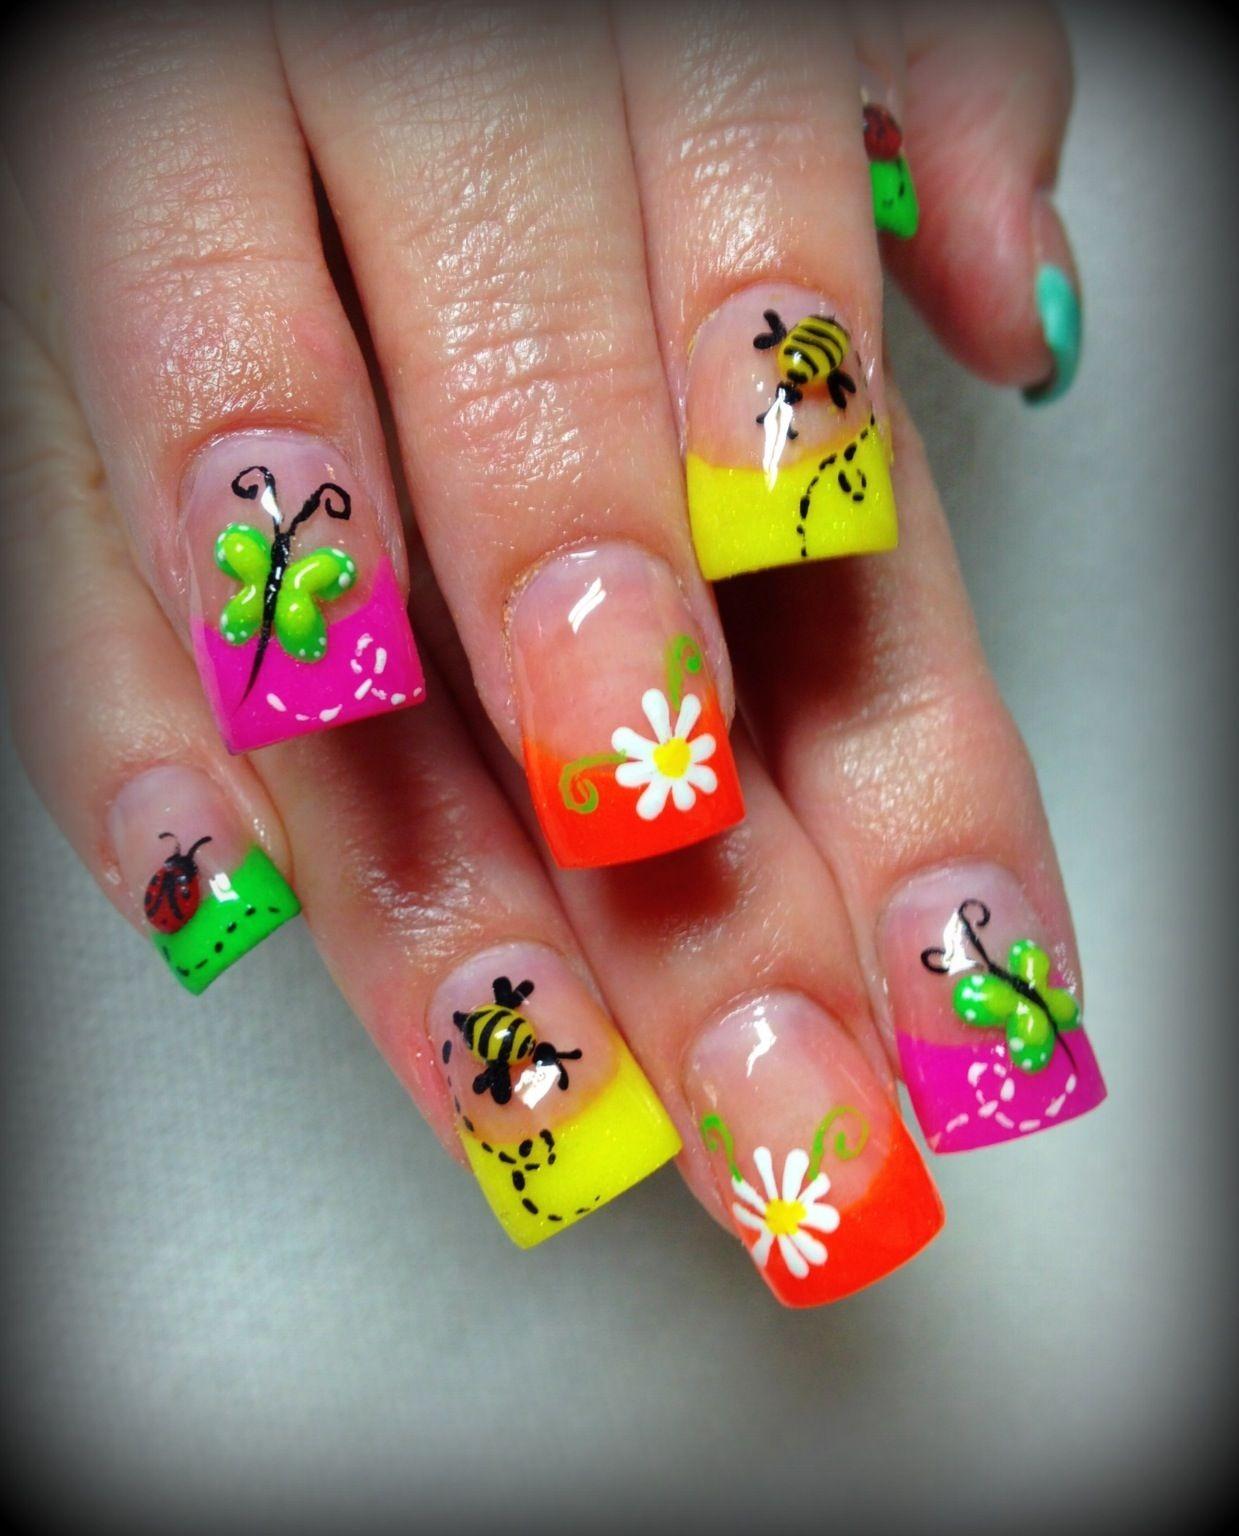 Saran Wrap Manicure with studs nail art by AH Nail Art